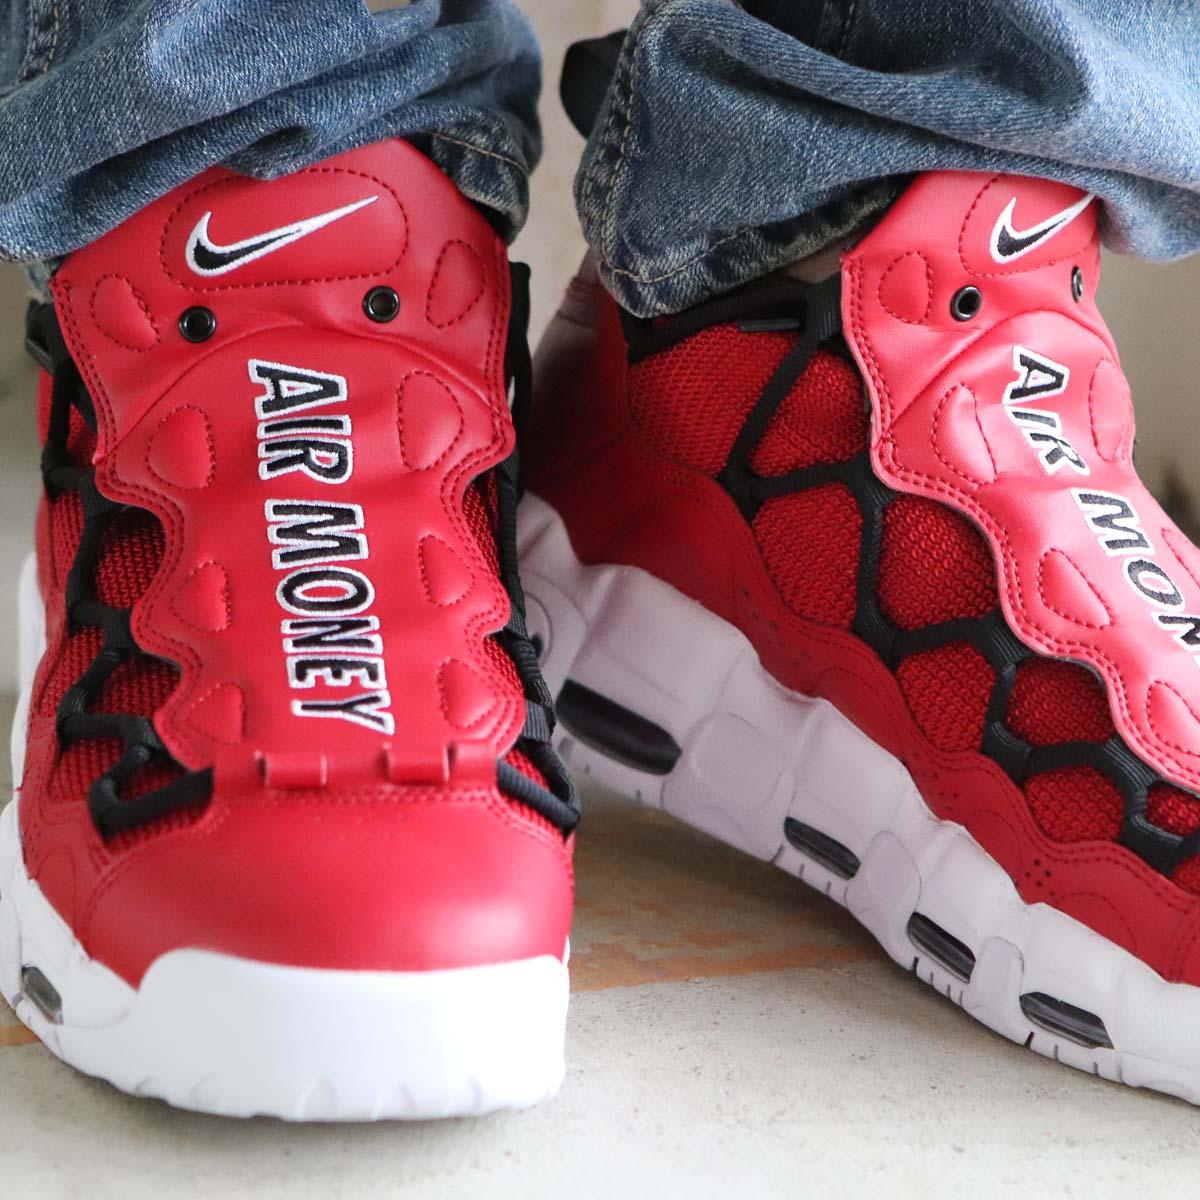 84325fa7d0d63c atmos pink  NIKE AIR MORE MONEY (Nike air more money) (GYM RED BLACK ...